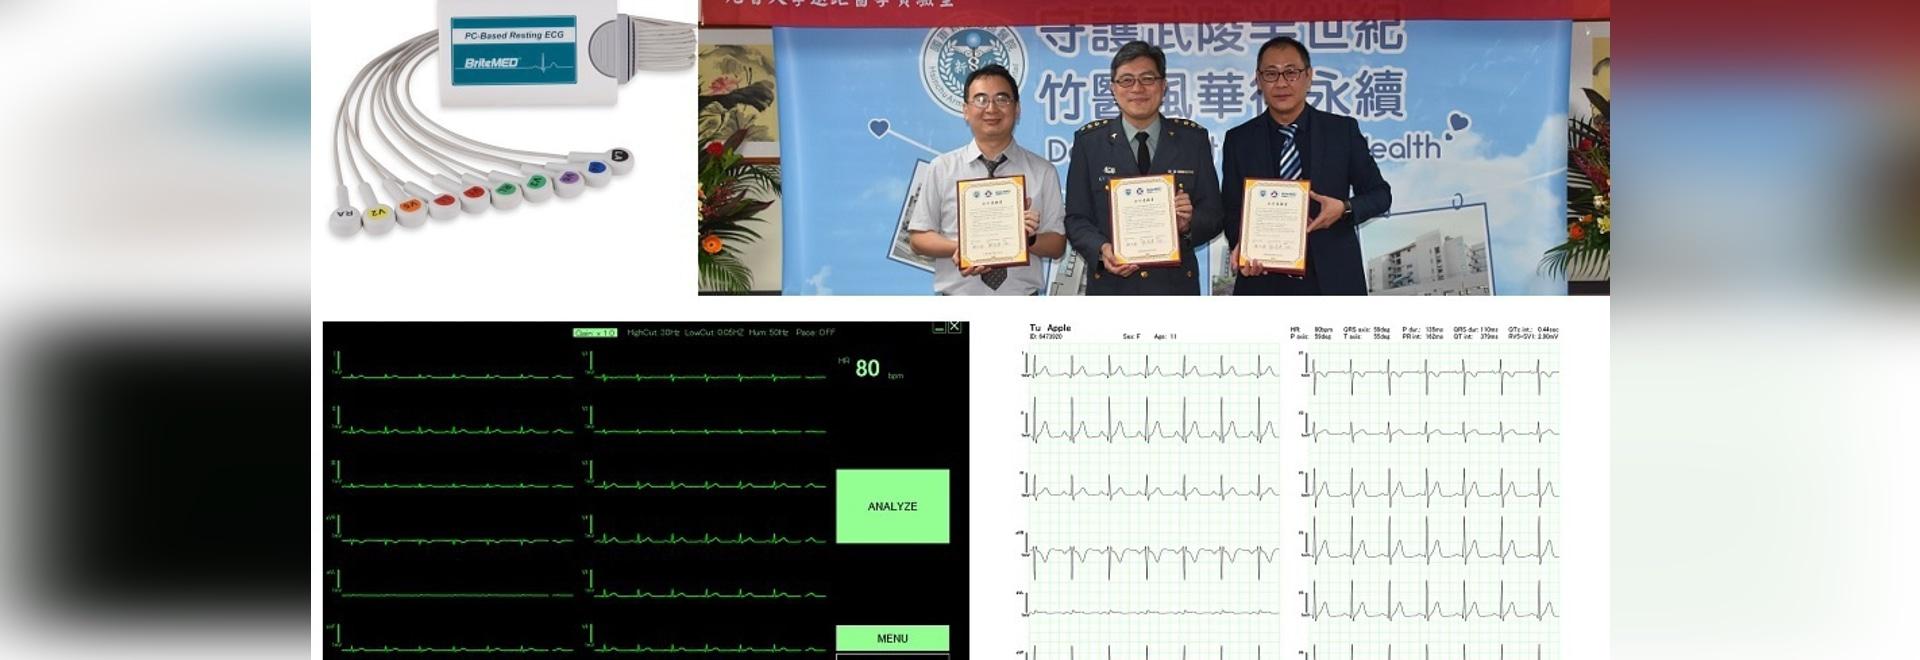 Portable 12-Lead ECG Diagnosis System Enhances Quality of Home Medical Service